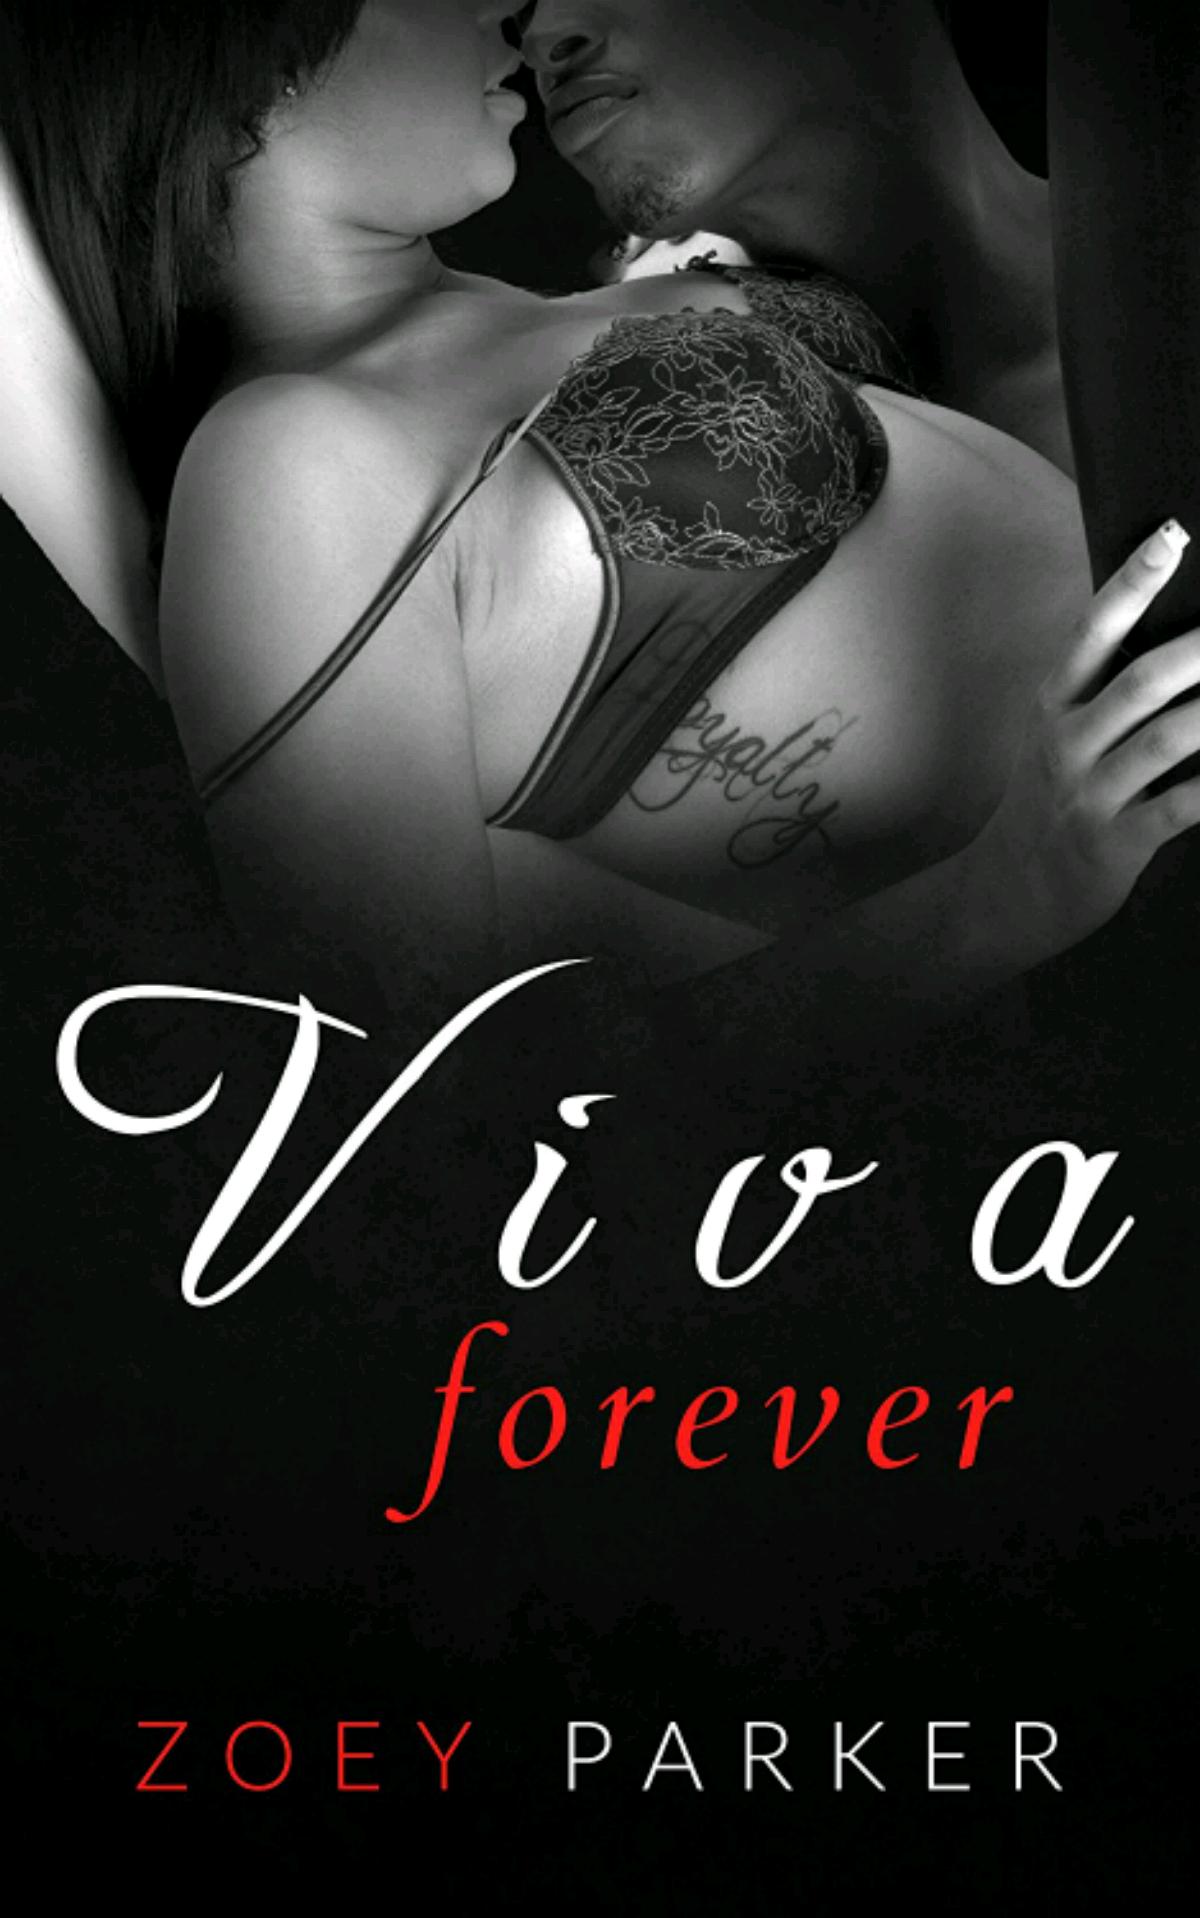 (Amazon kindle) Viva Forever  (Erotik ab 18)